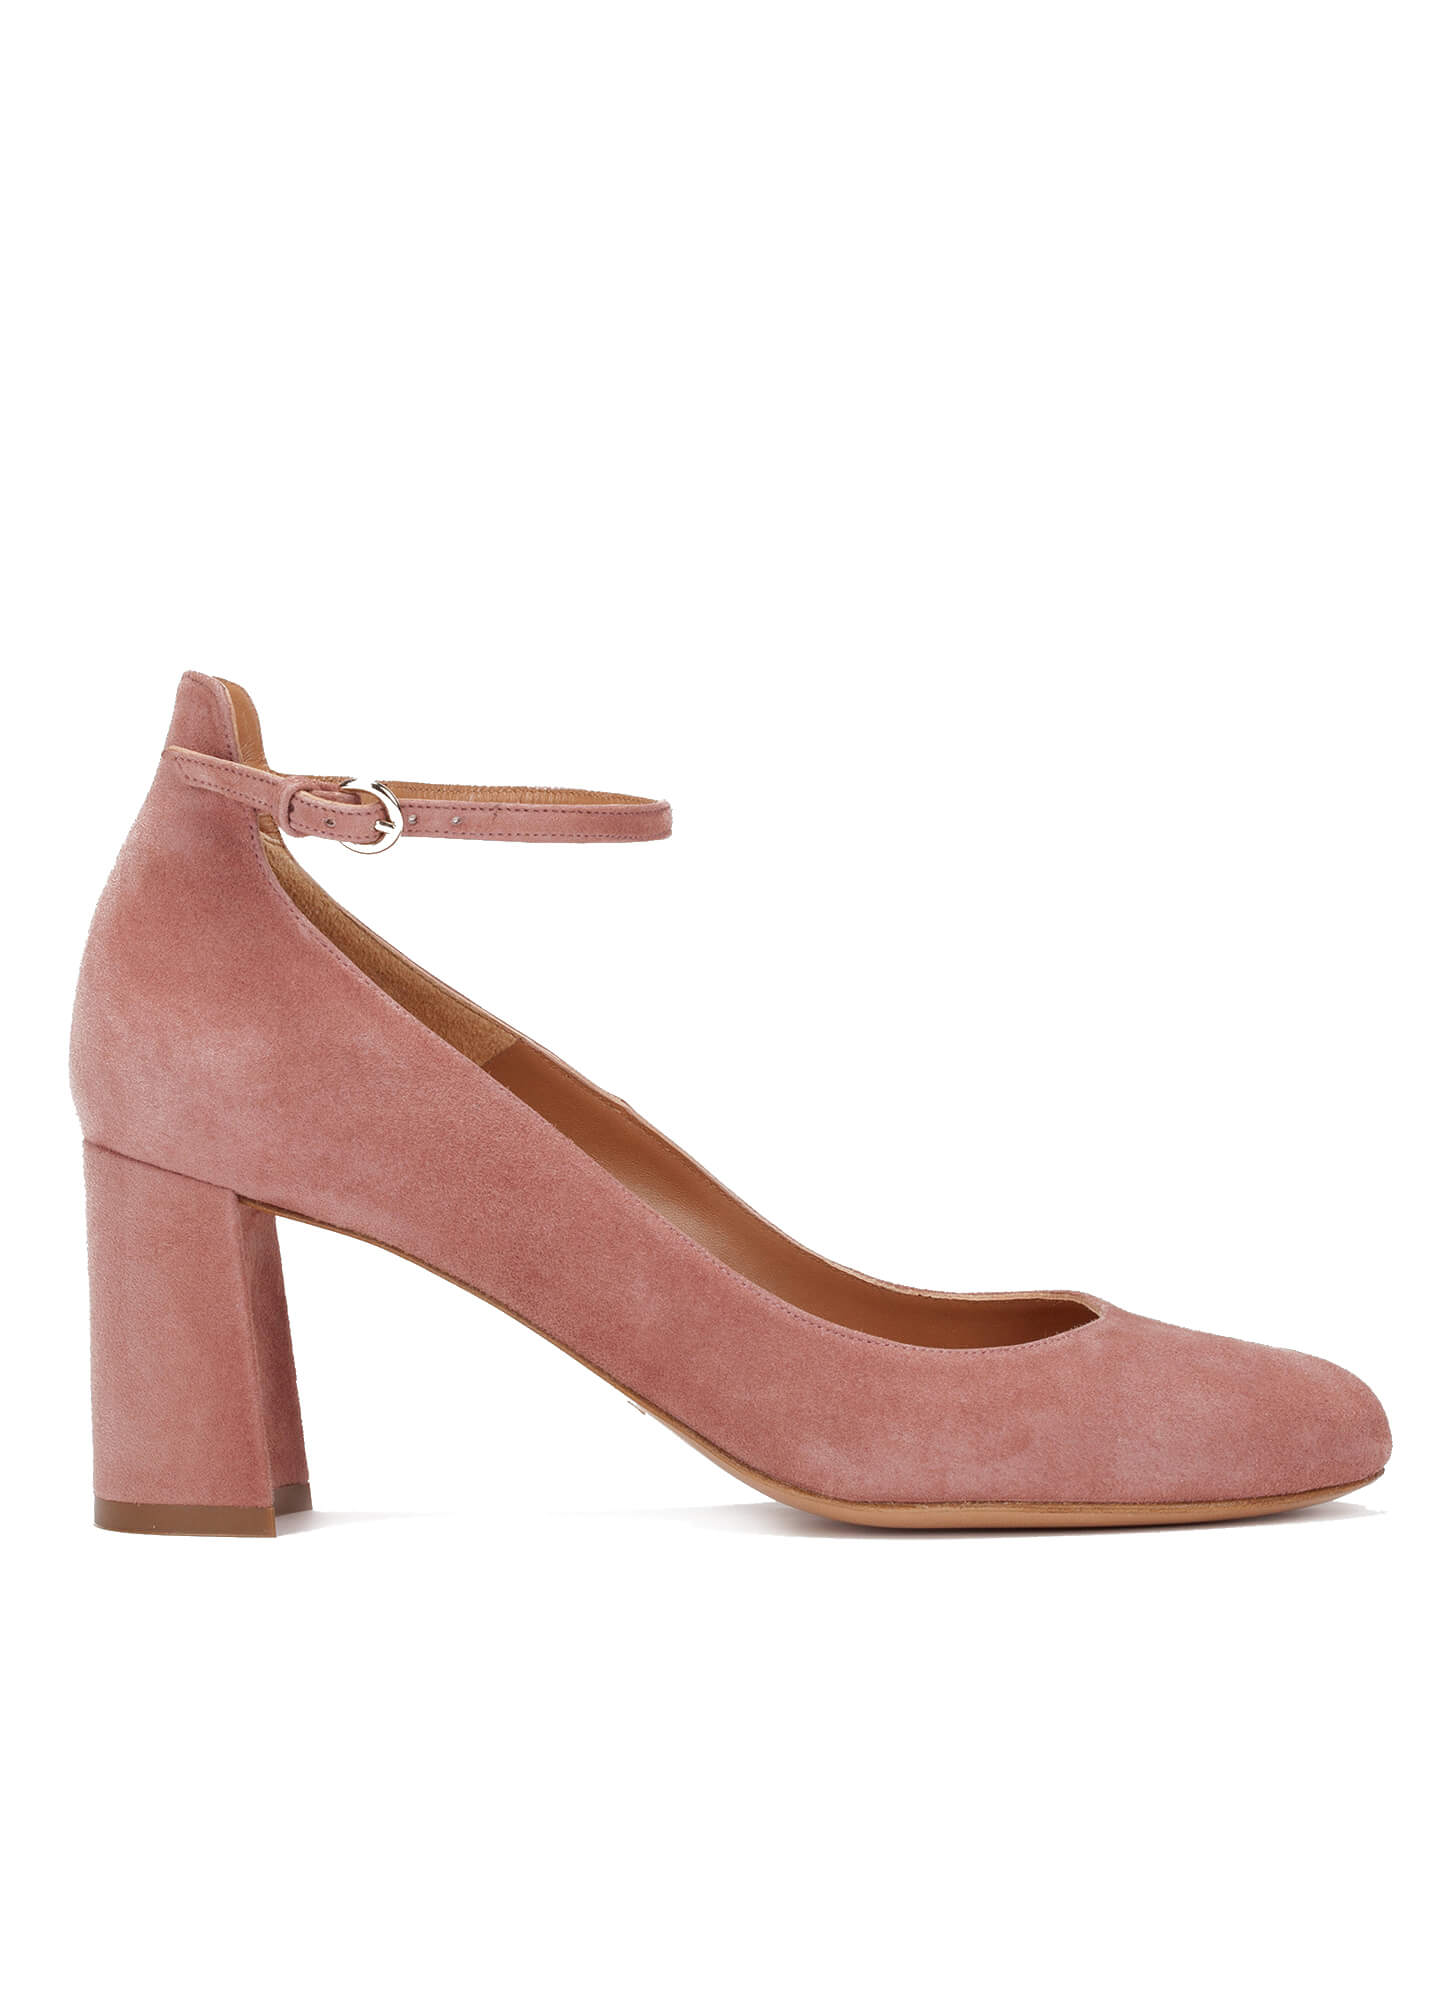 ff32afc03abd Mid heel shoes in pink suede - online shoe store Pura Lopez . PURA LOPEZ